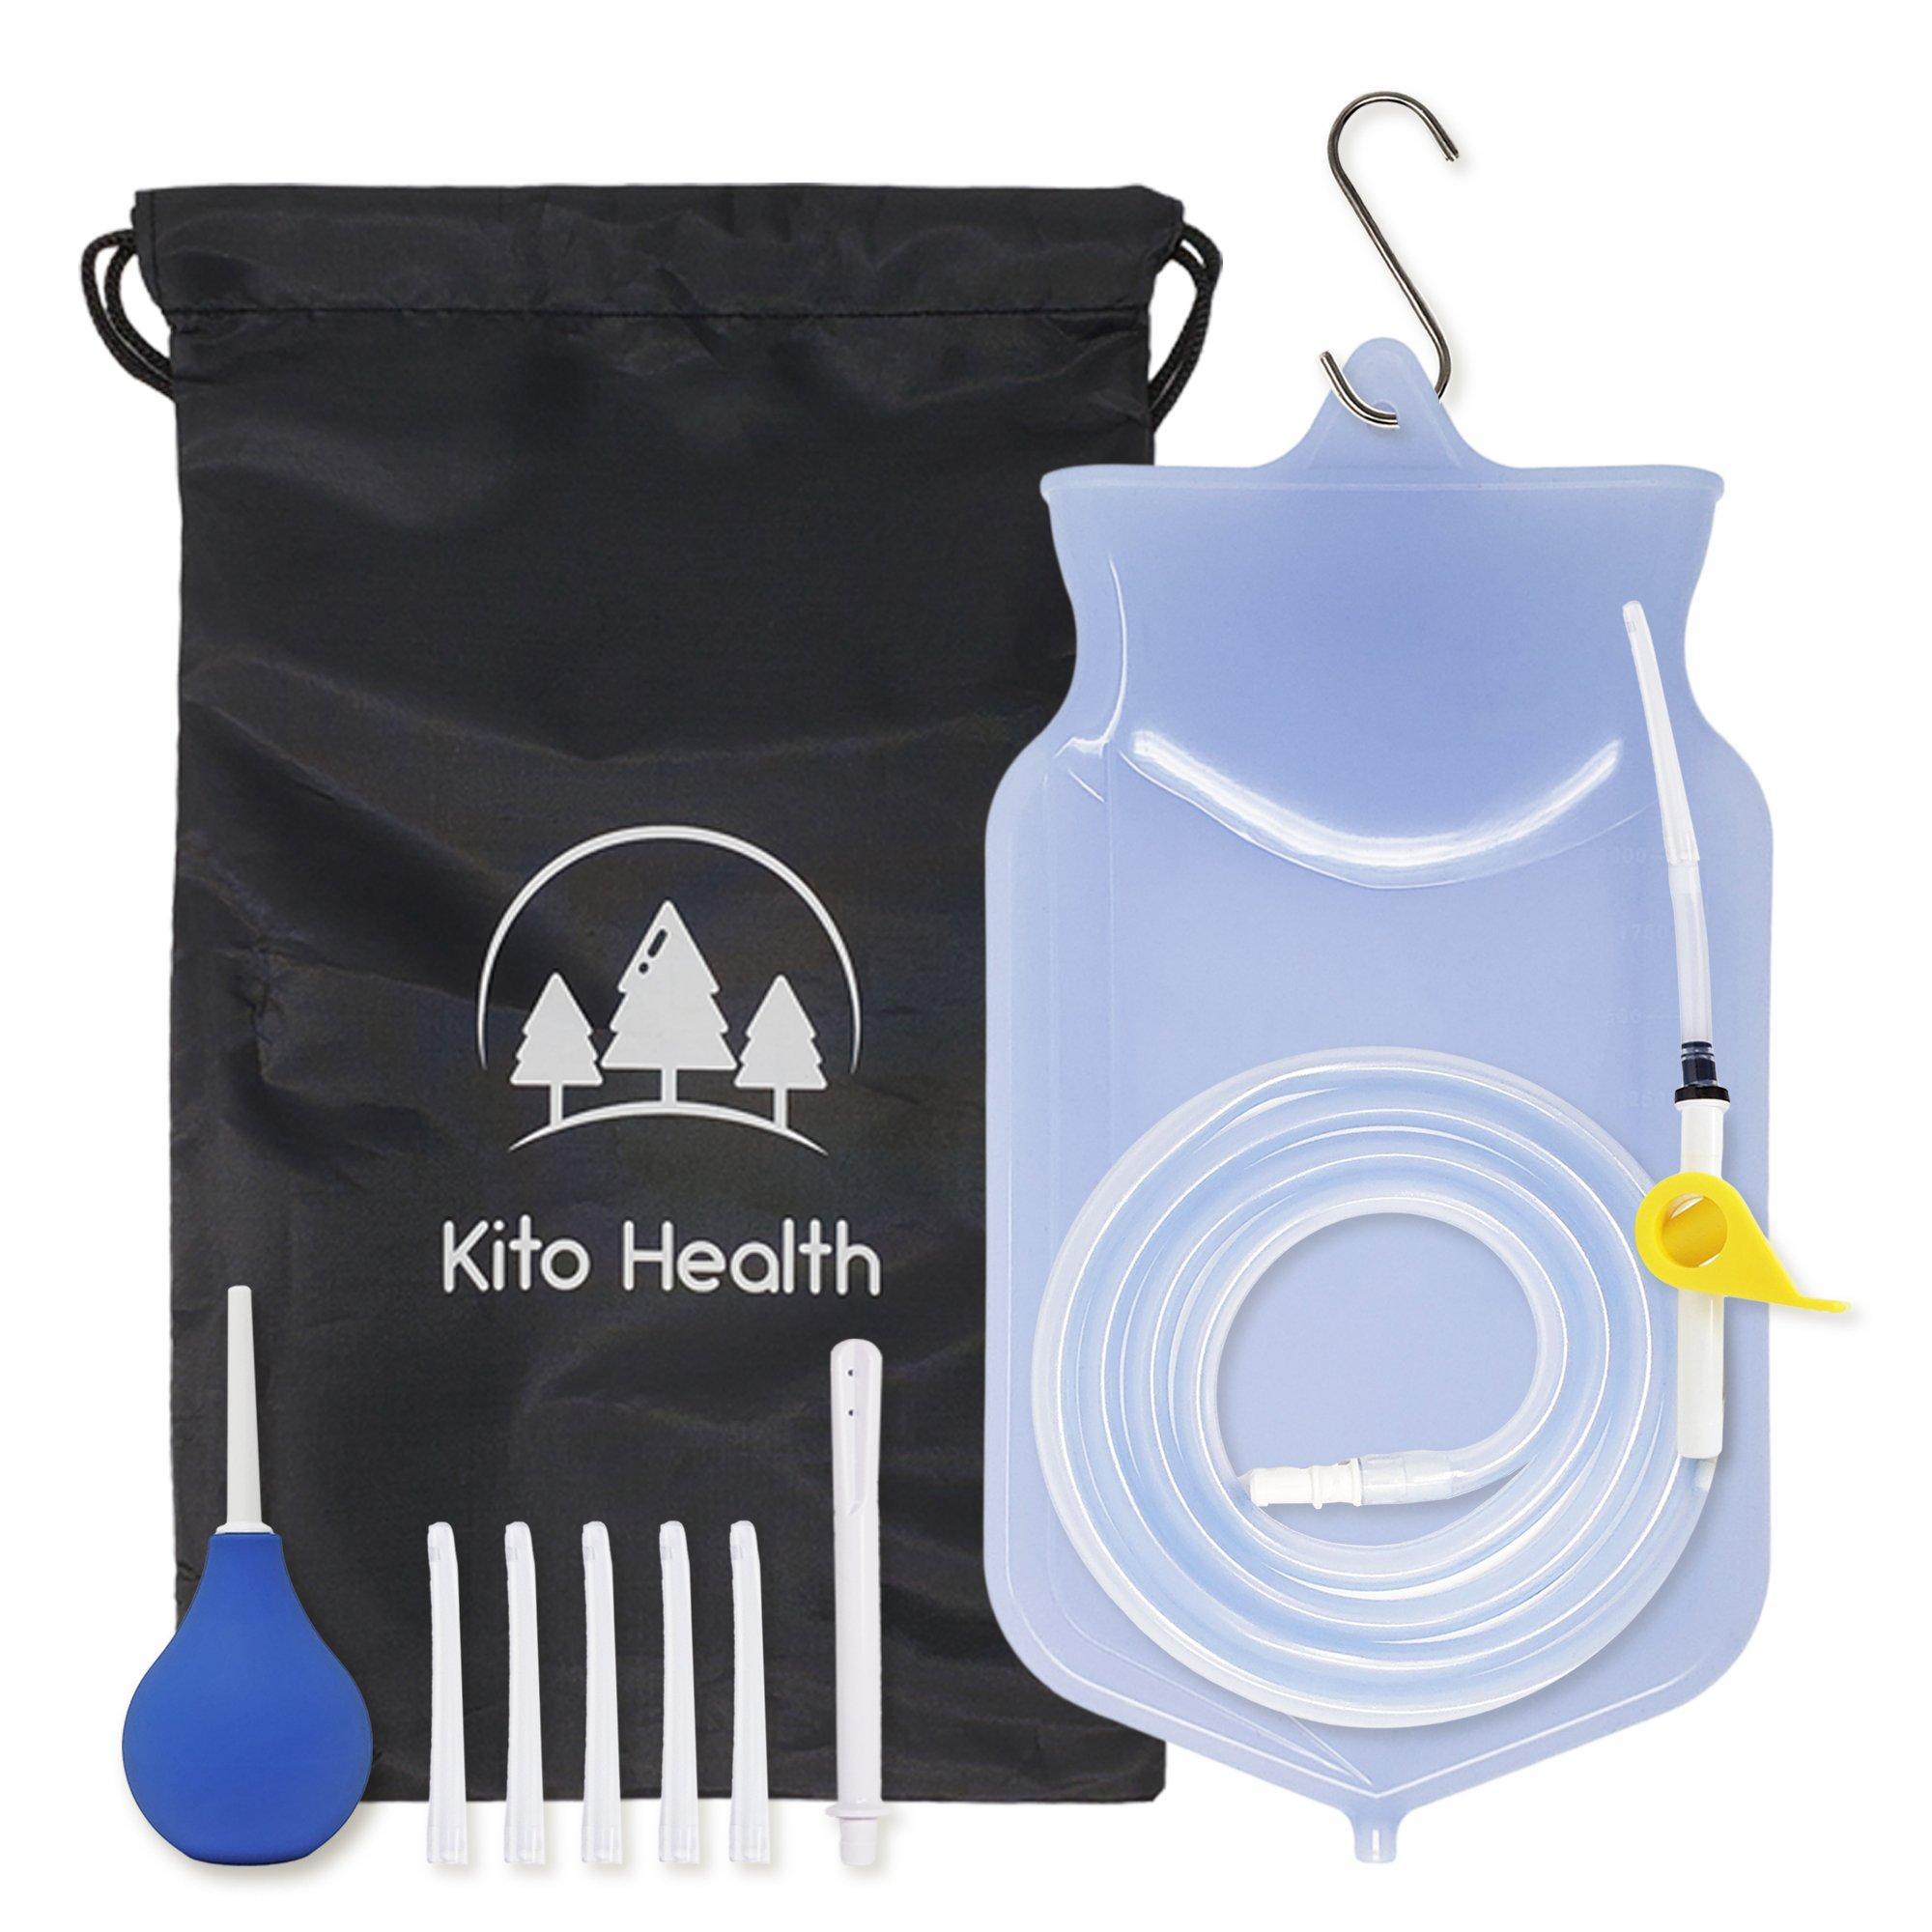 Enema Kit Silicone Bag | Home Coffee & Water Colon Cleansing Irrigation | Women Men Reusable Enema | Enema Bulb Douche